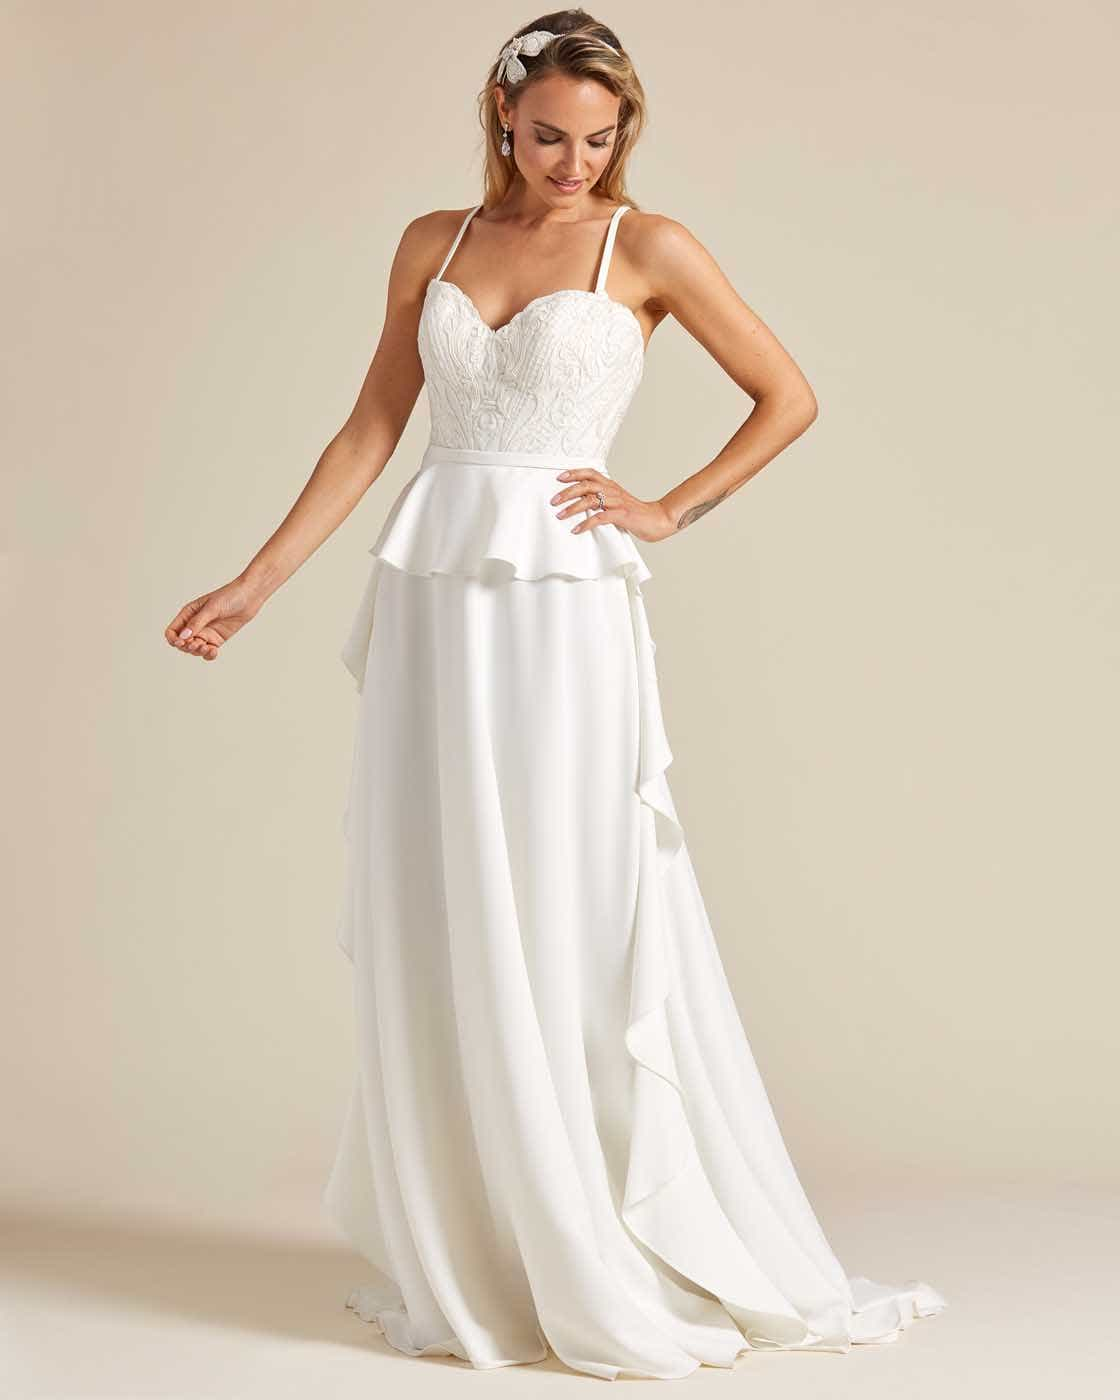 White Ballerina Waist Wedding Dress - Front